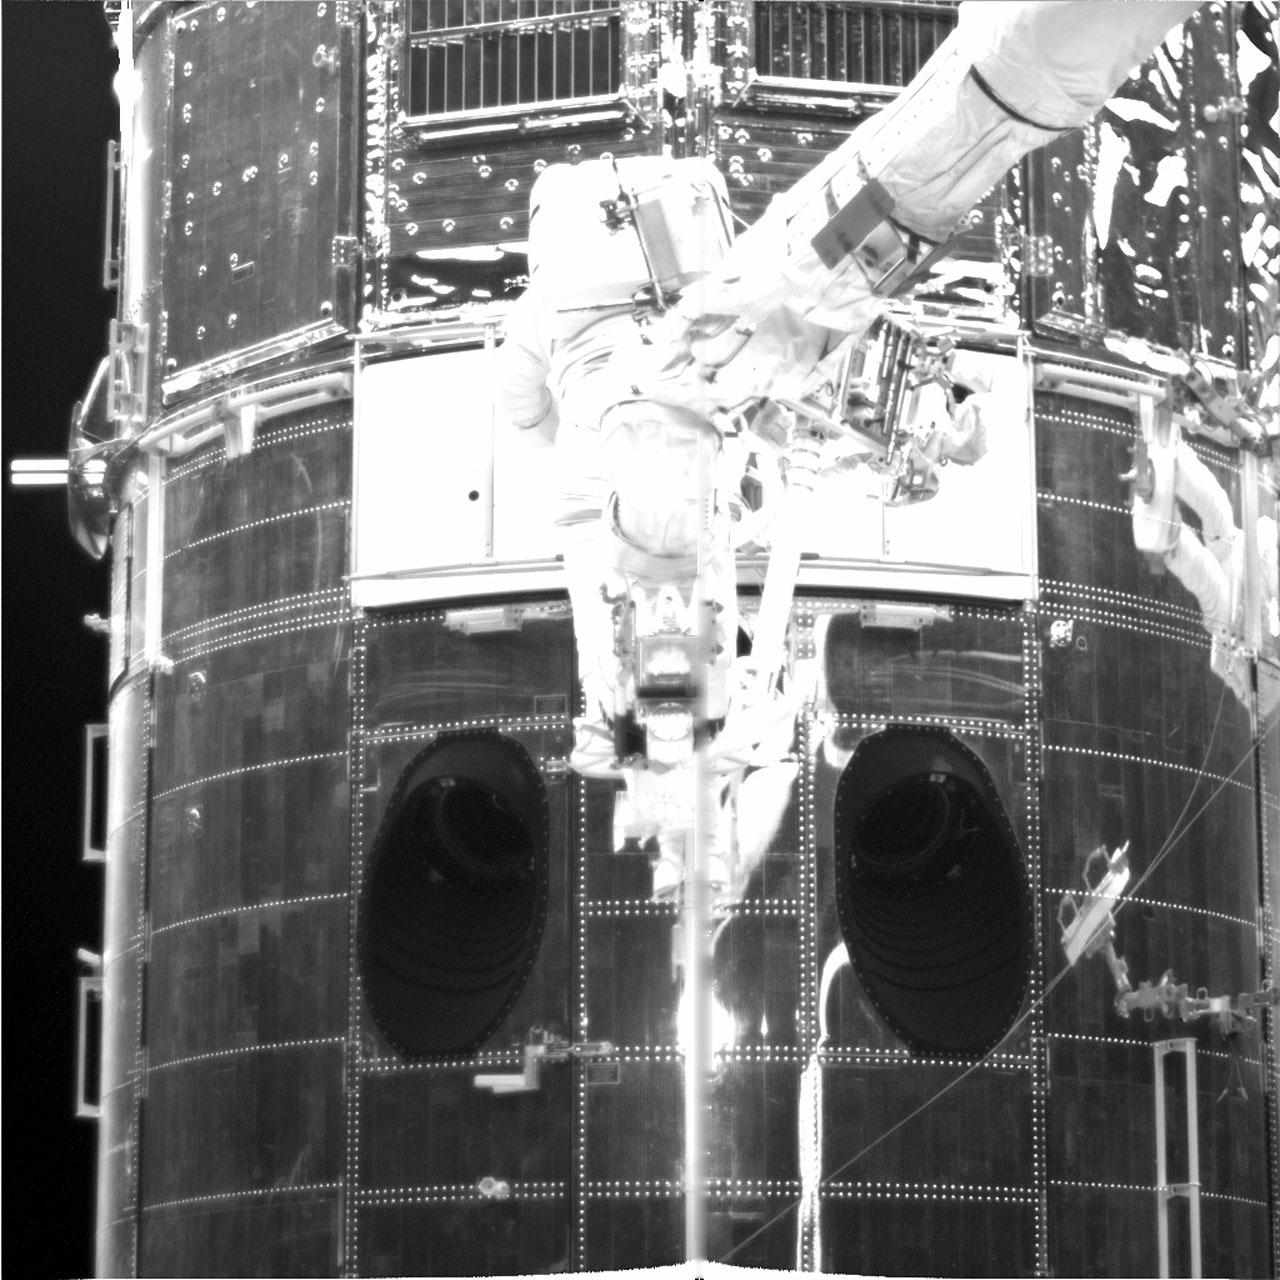 WFPC Camera Insertion